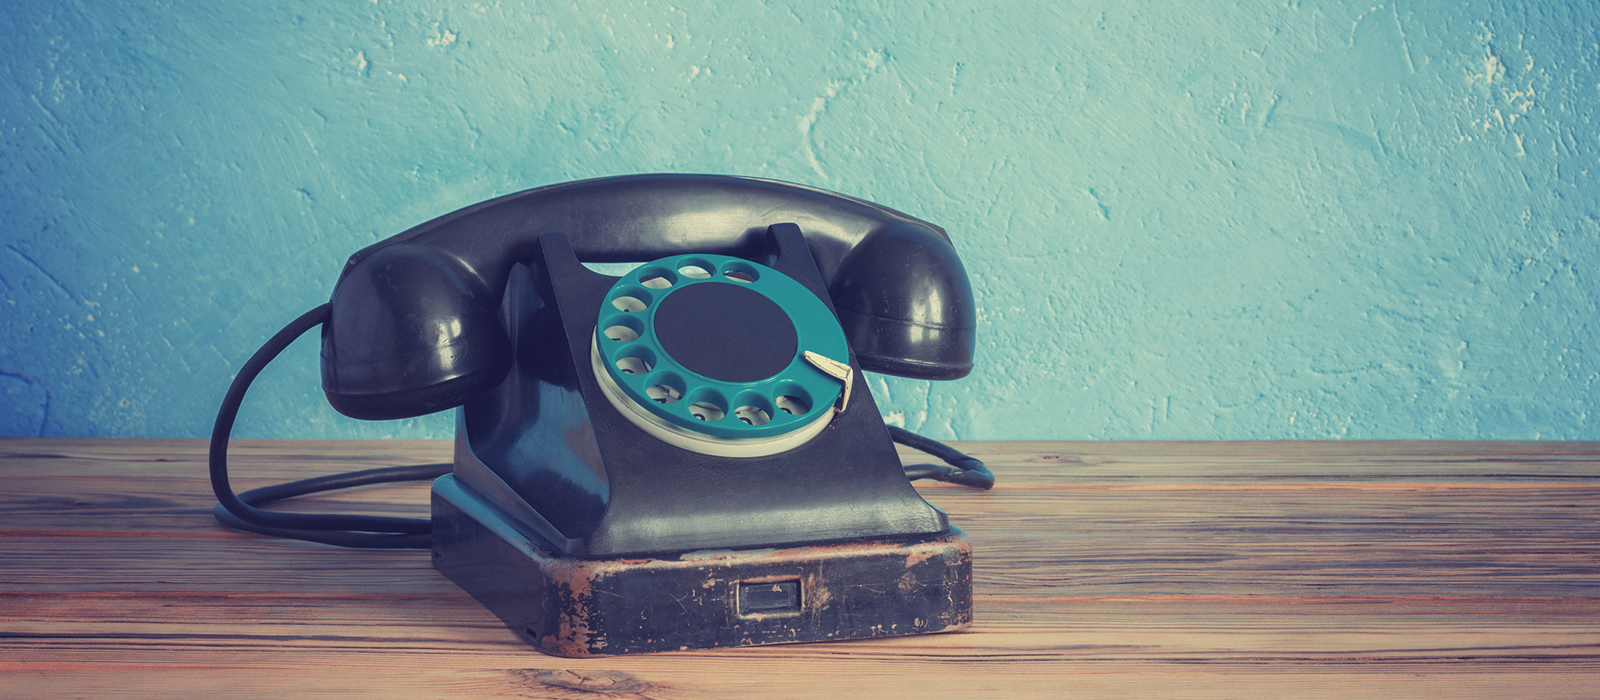 iStock-512204924 old telephone phone banner